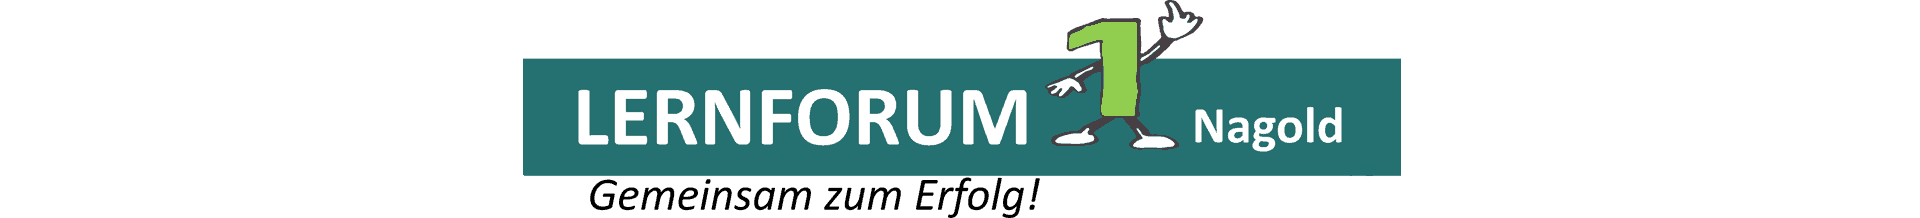 Lernfoum Nagold Logo